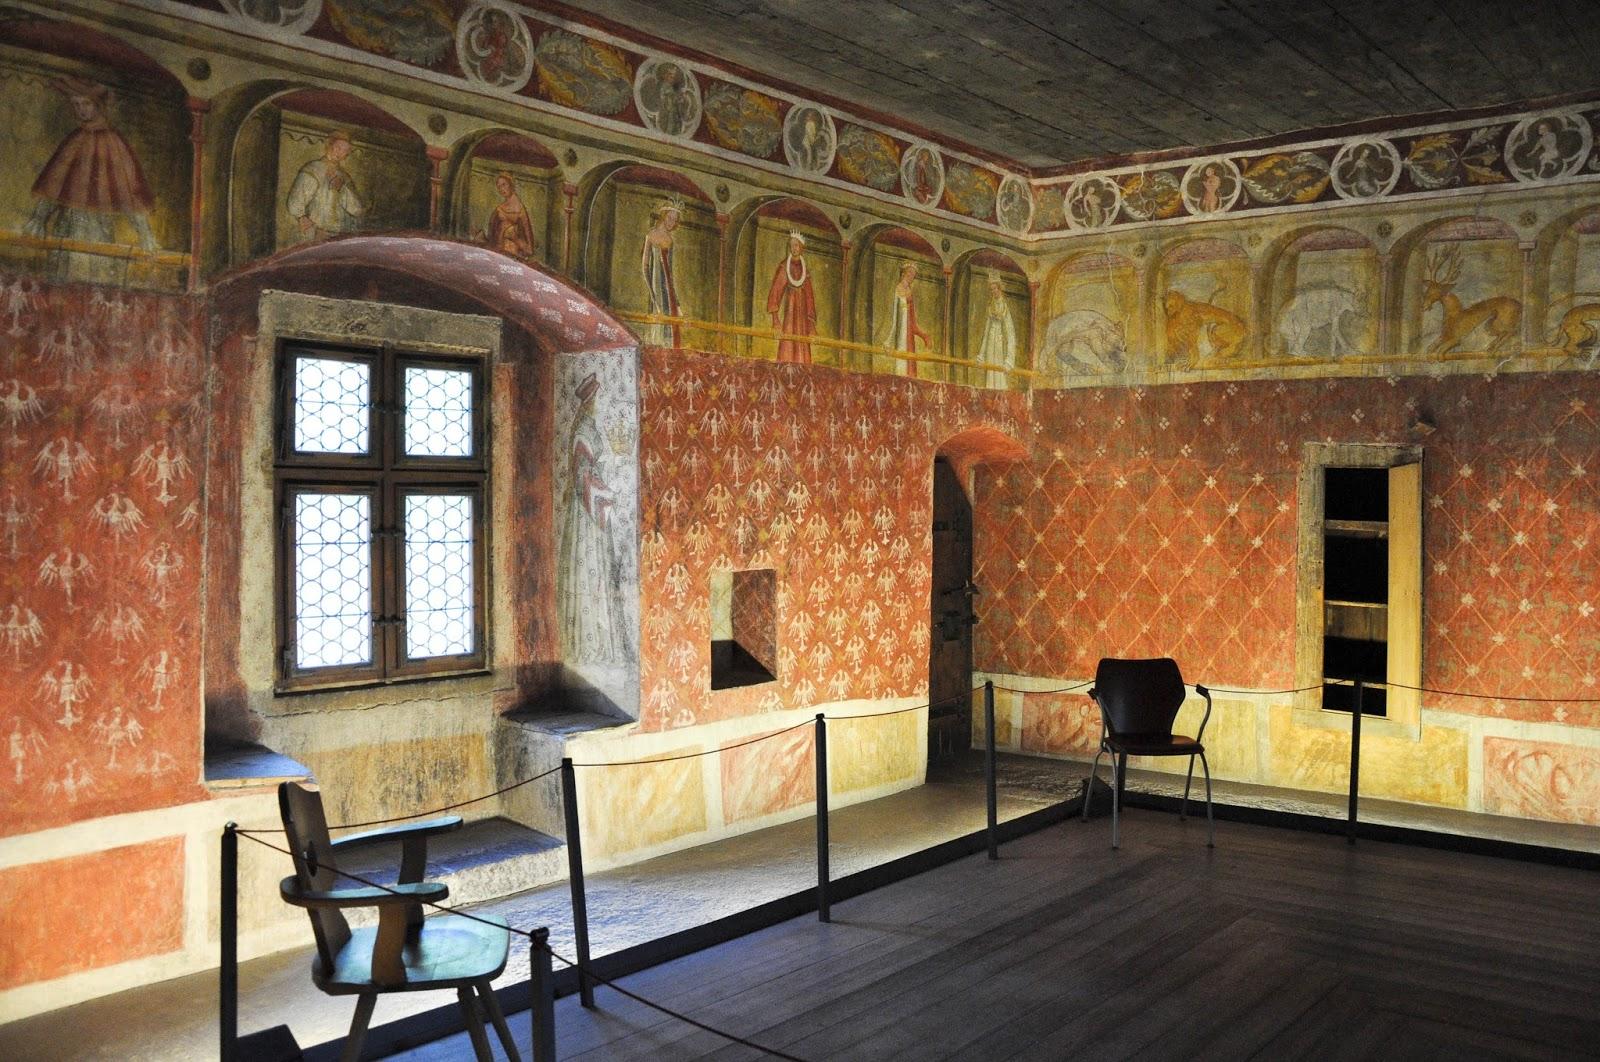 Frescoed room, Runkelstein Castle, Bolzano, South Tyrol, Italy